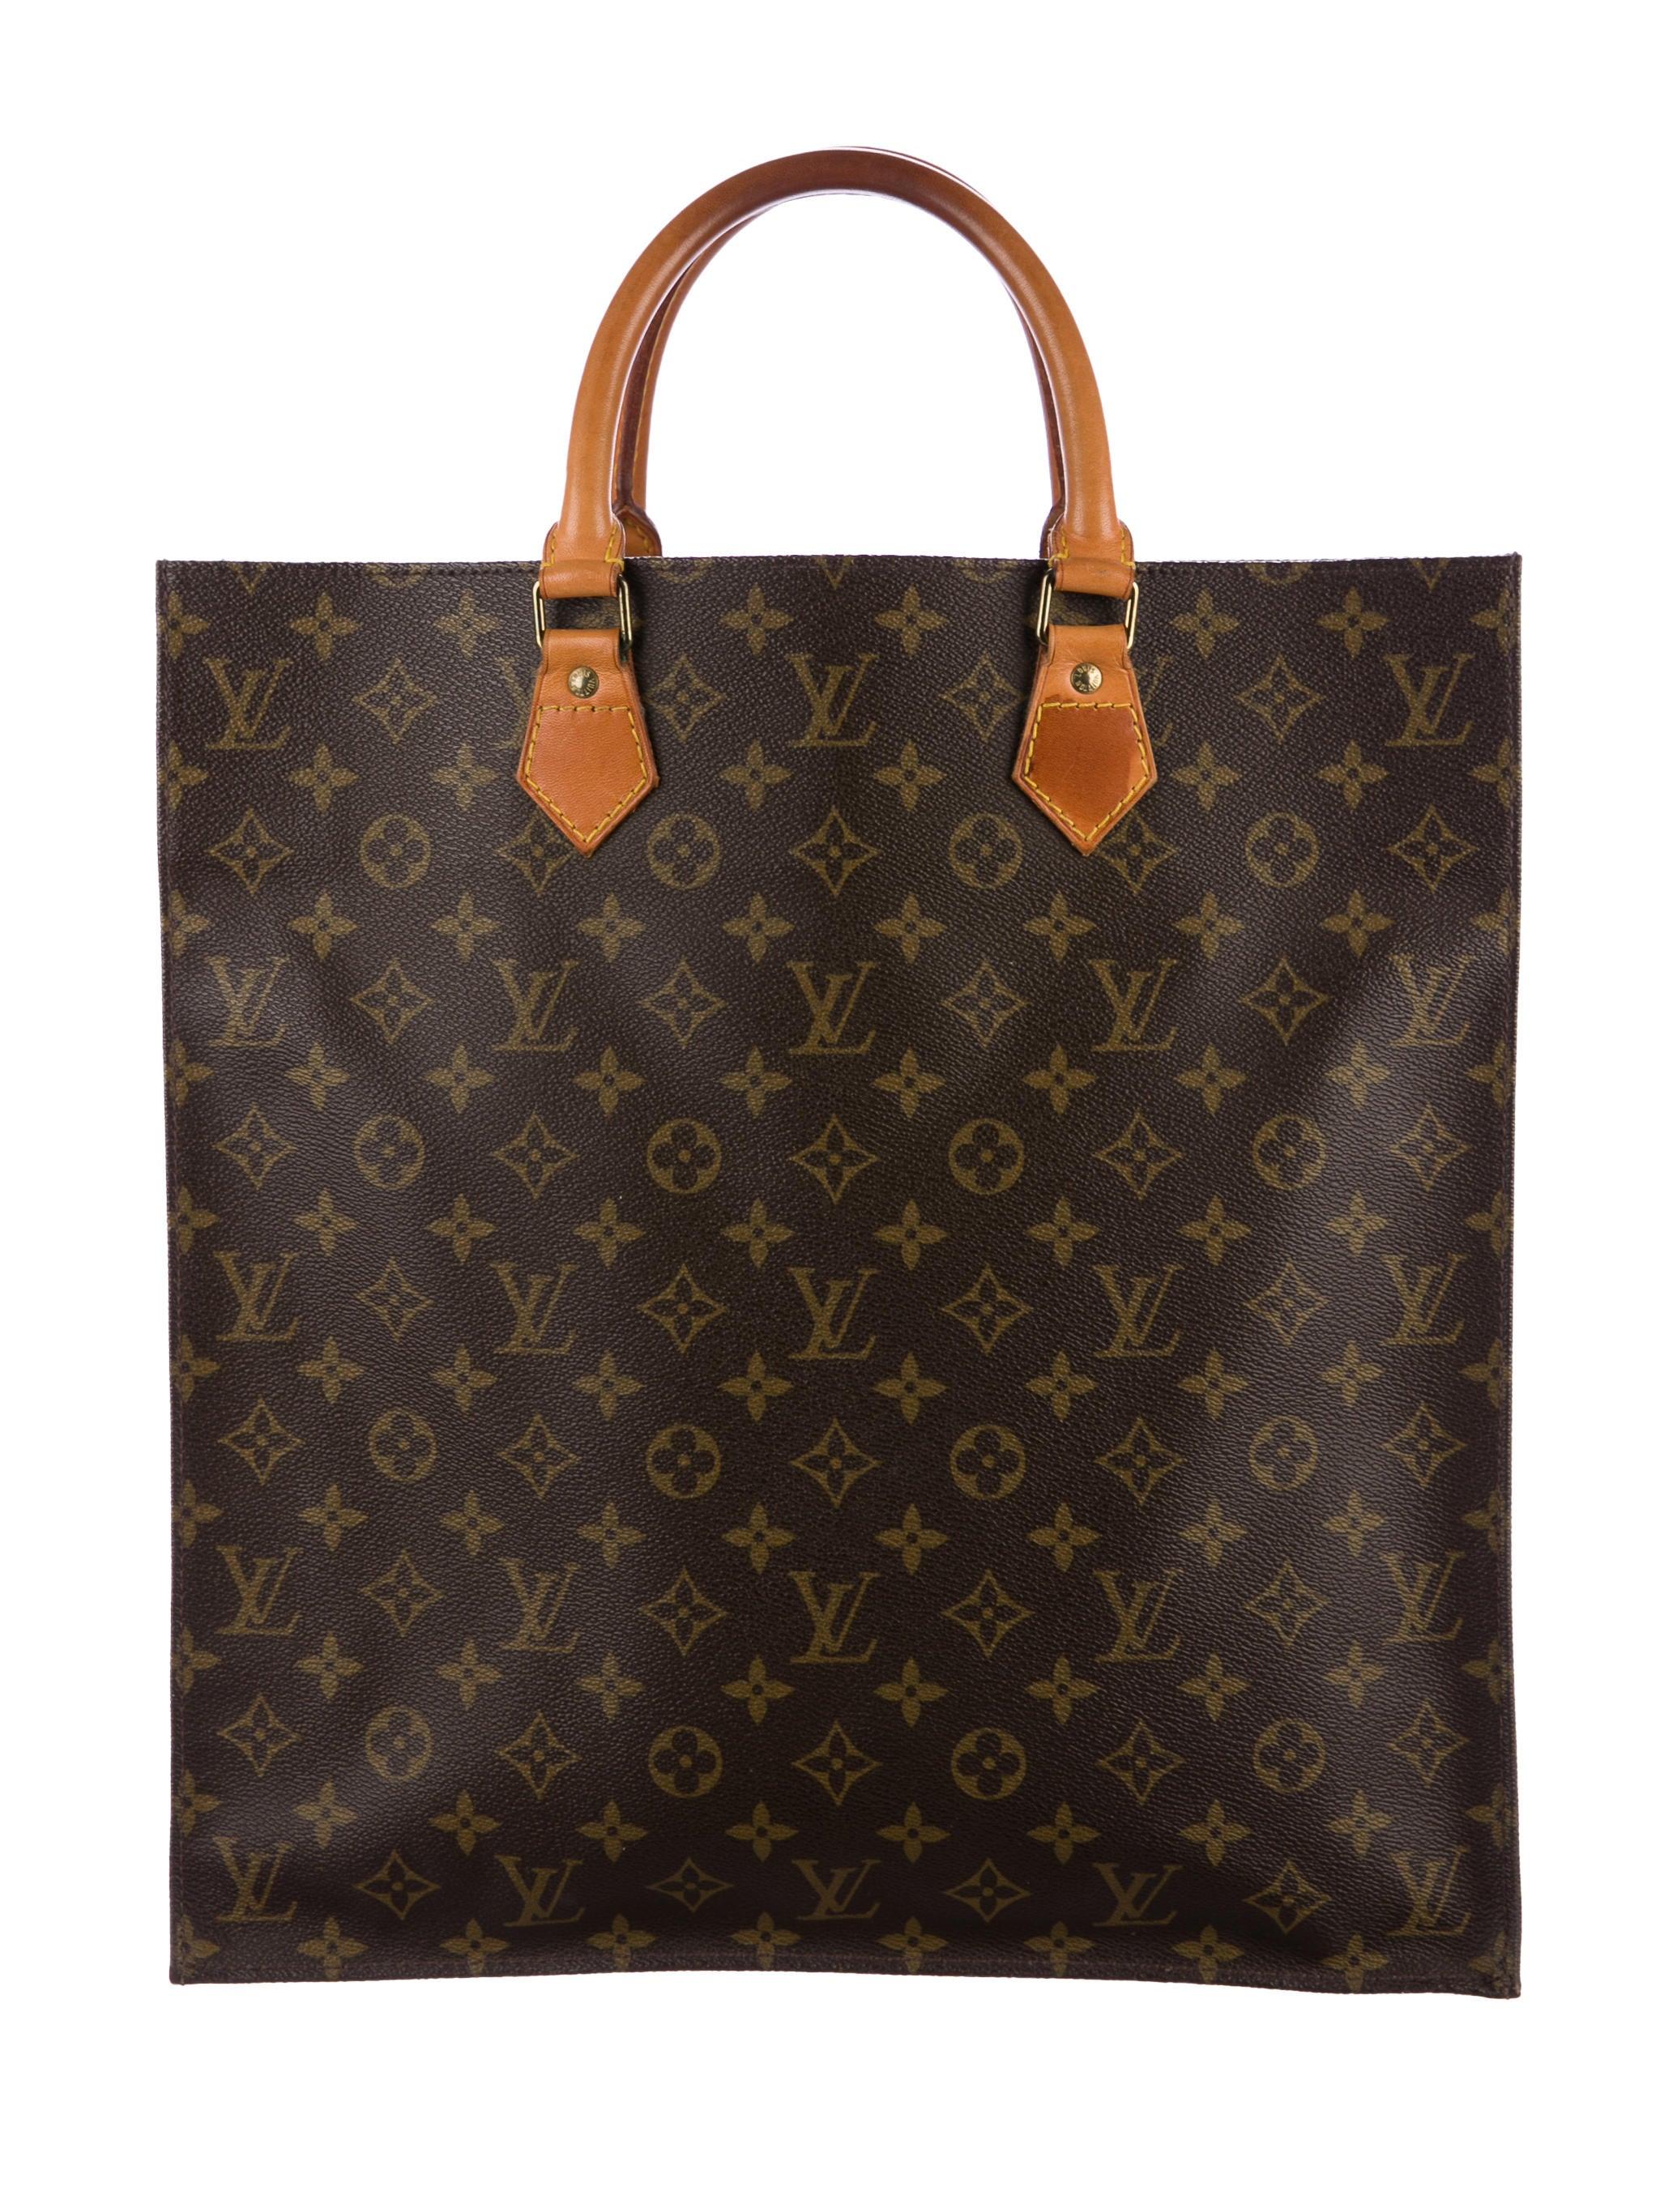 Louis vuitton monogram sac plat bags lou132855 the for Louis vuitton monogram miroir sac plat